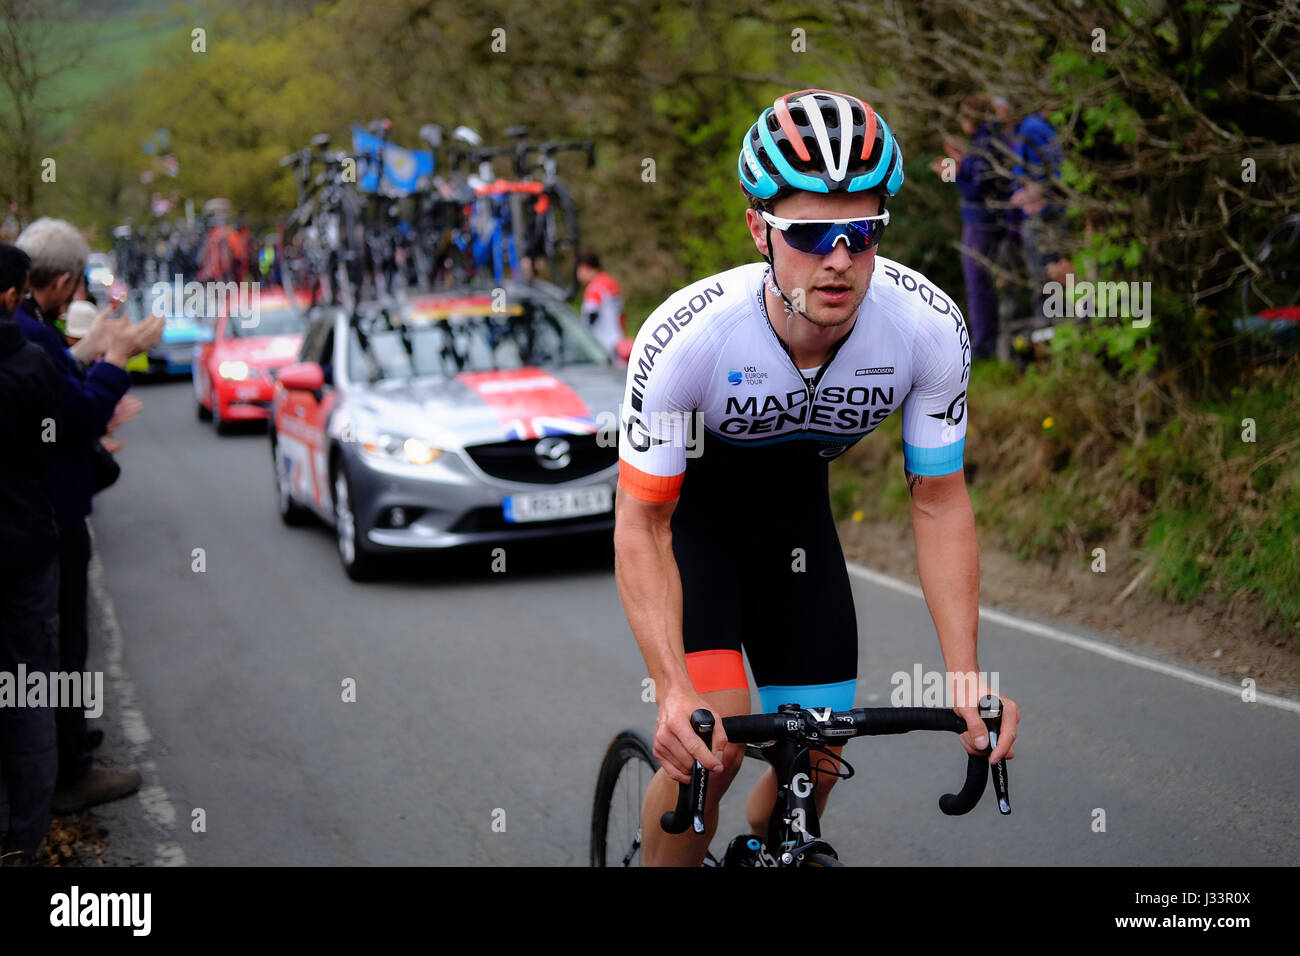 Matt Crenshaw Madison Genesis fährt die Côte de Silsden auf der dritten Stufe der dritten Tour de Yorkshire. Stockbild